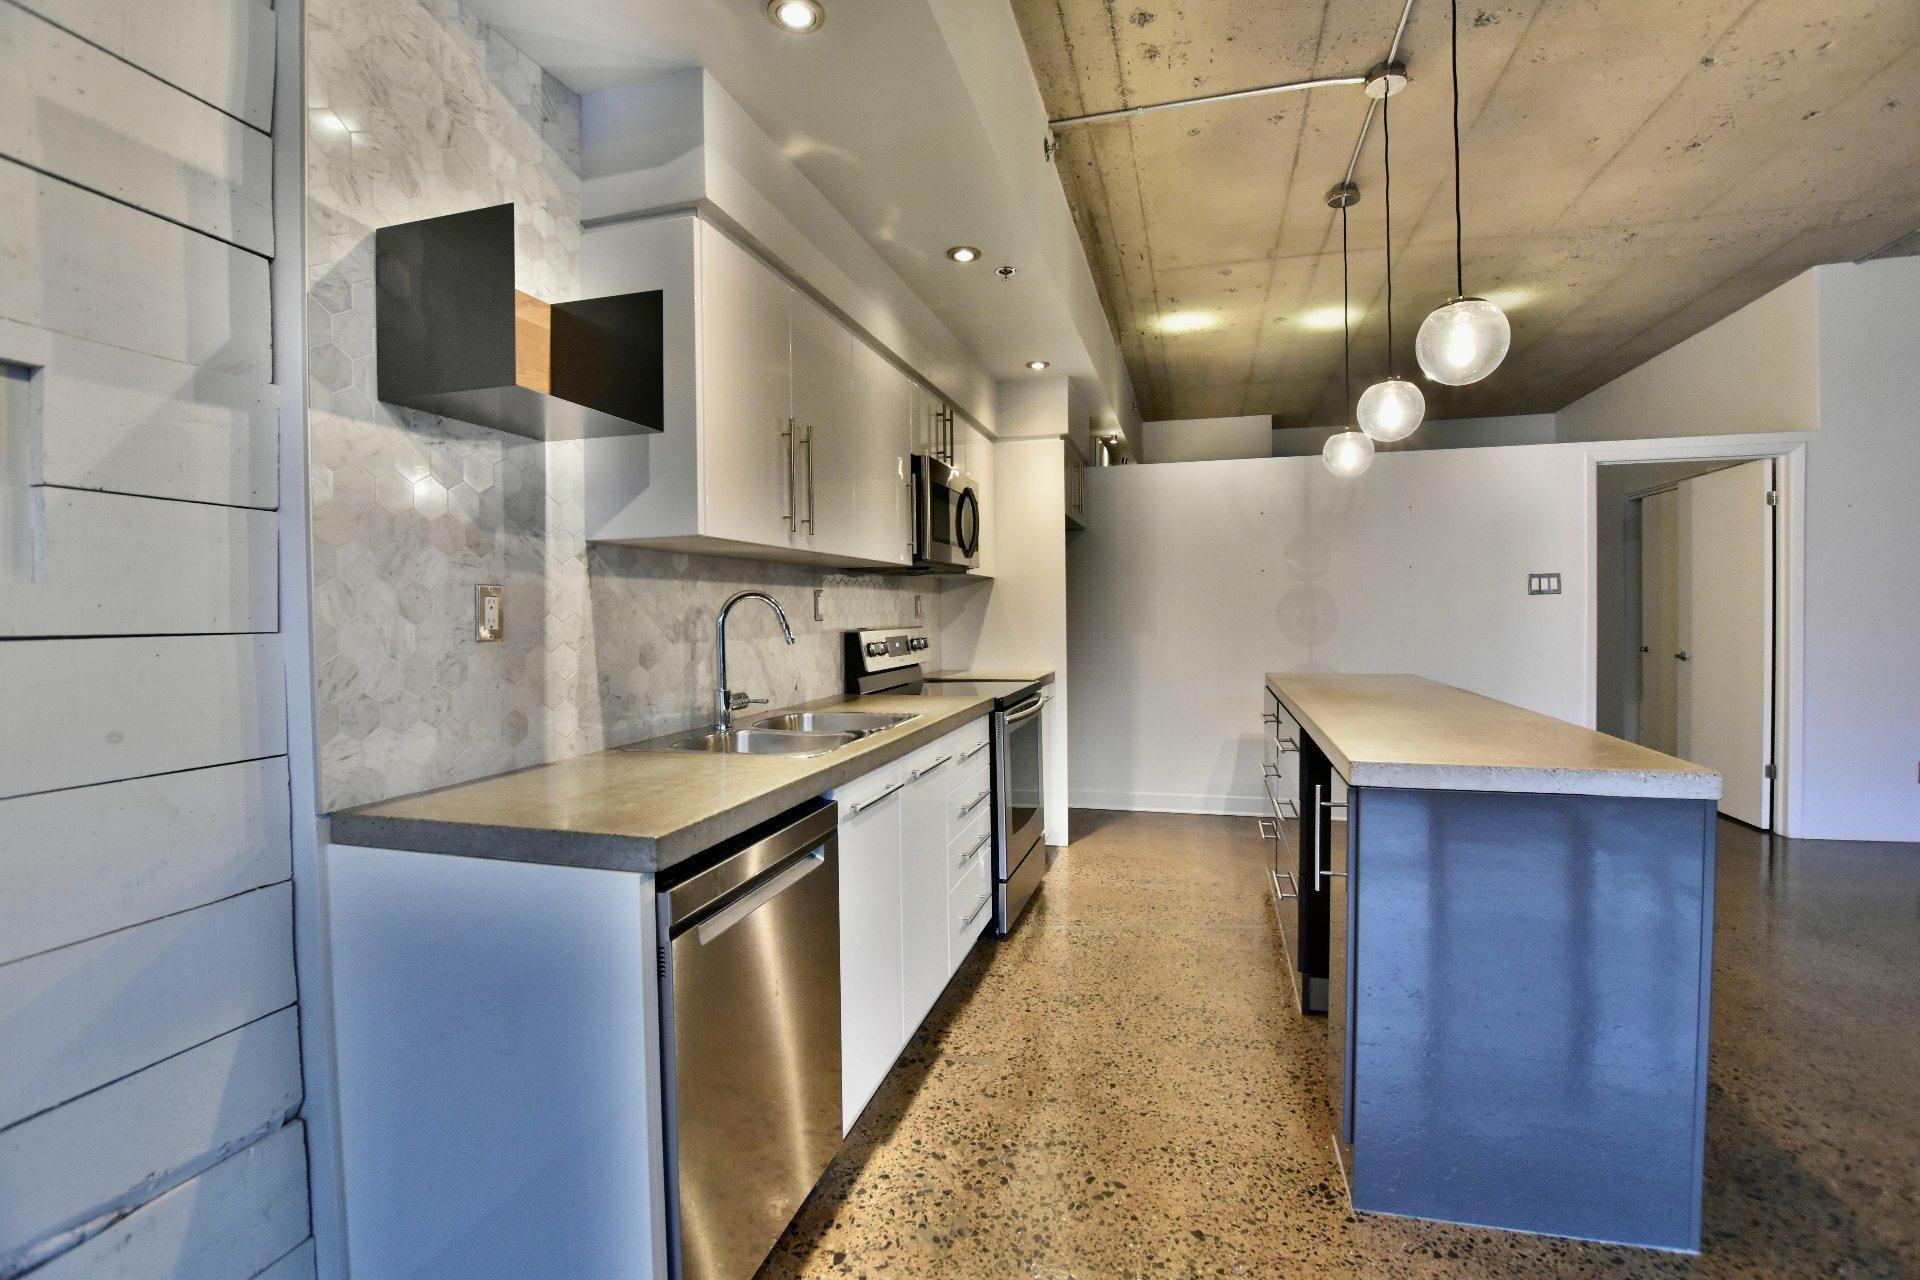 image 2 - Departamento Para alquiler Villeray/Saint-Michel/Parc-Extension Montréal  - 5 habitaciones